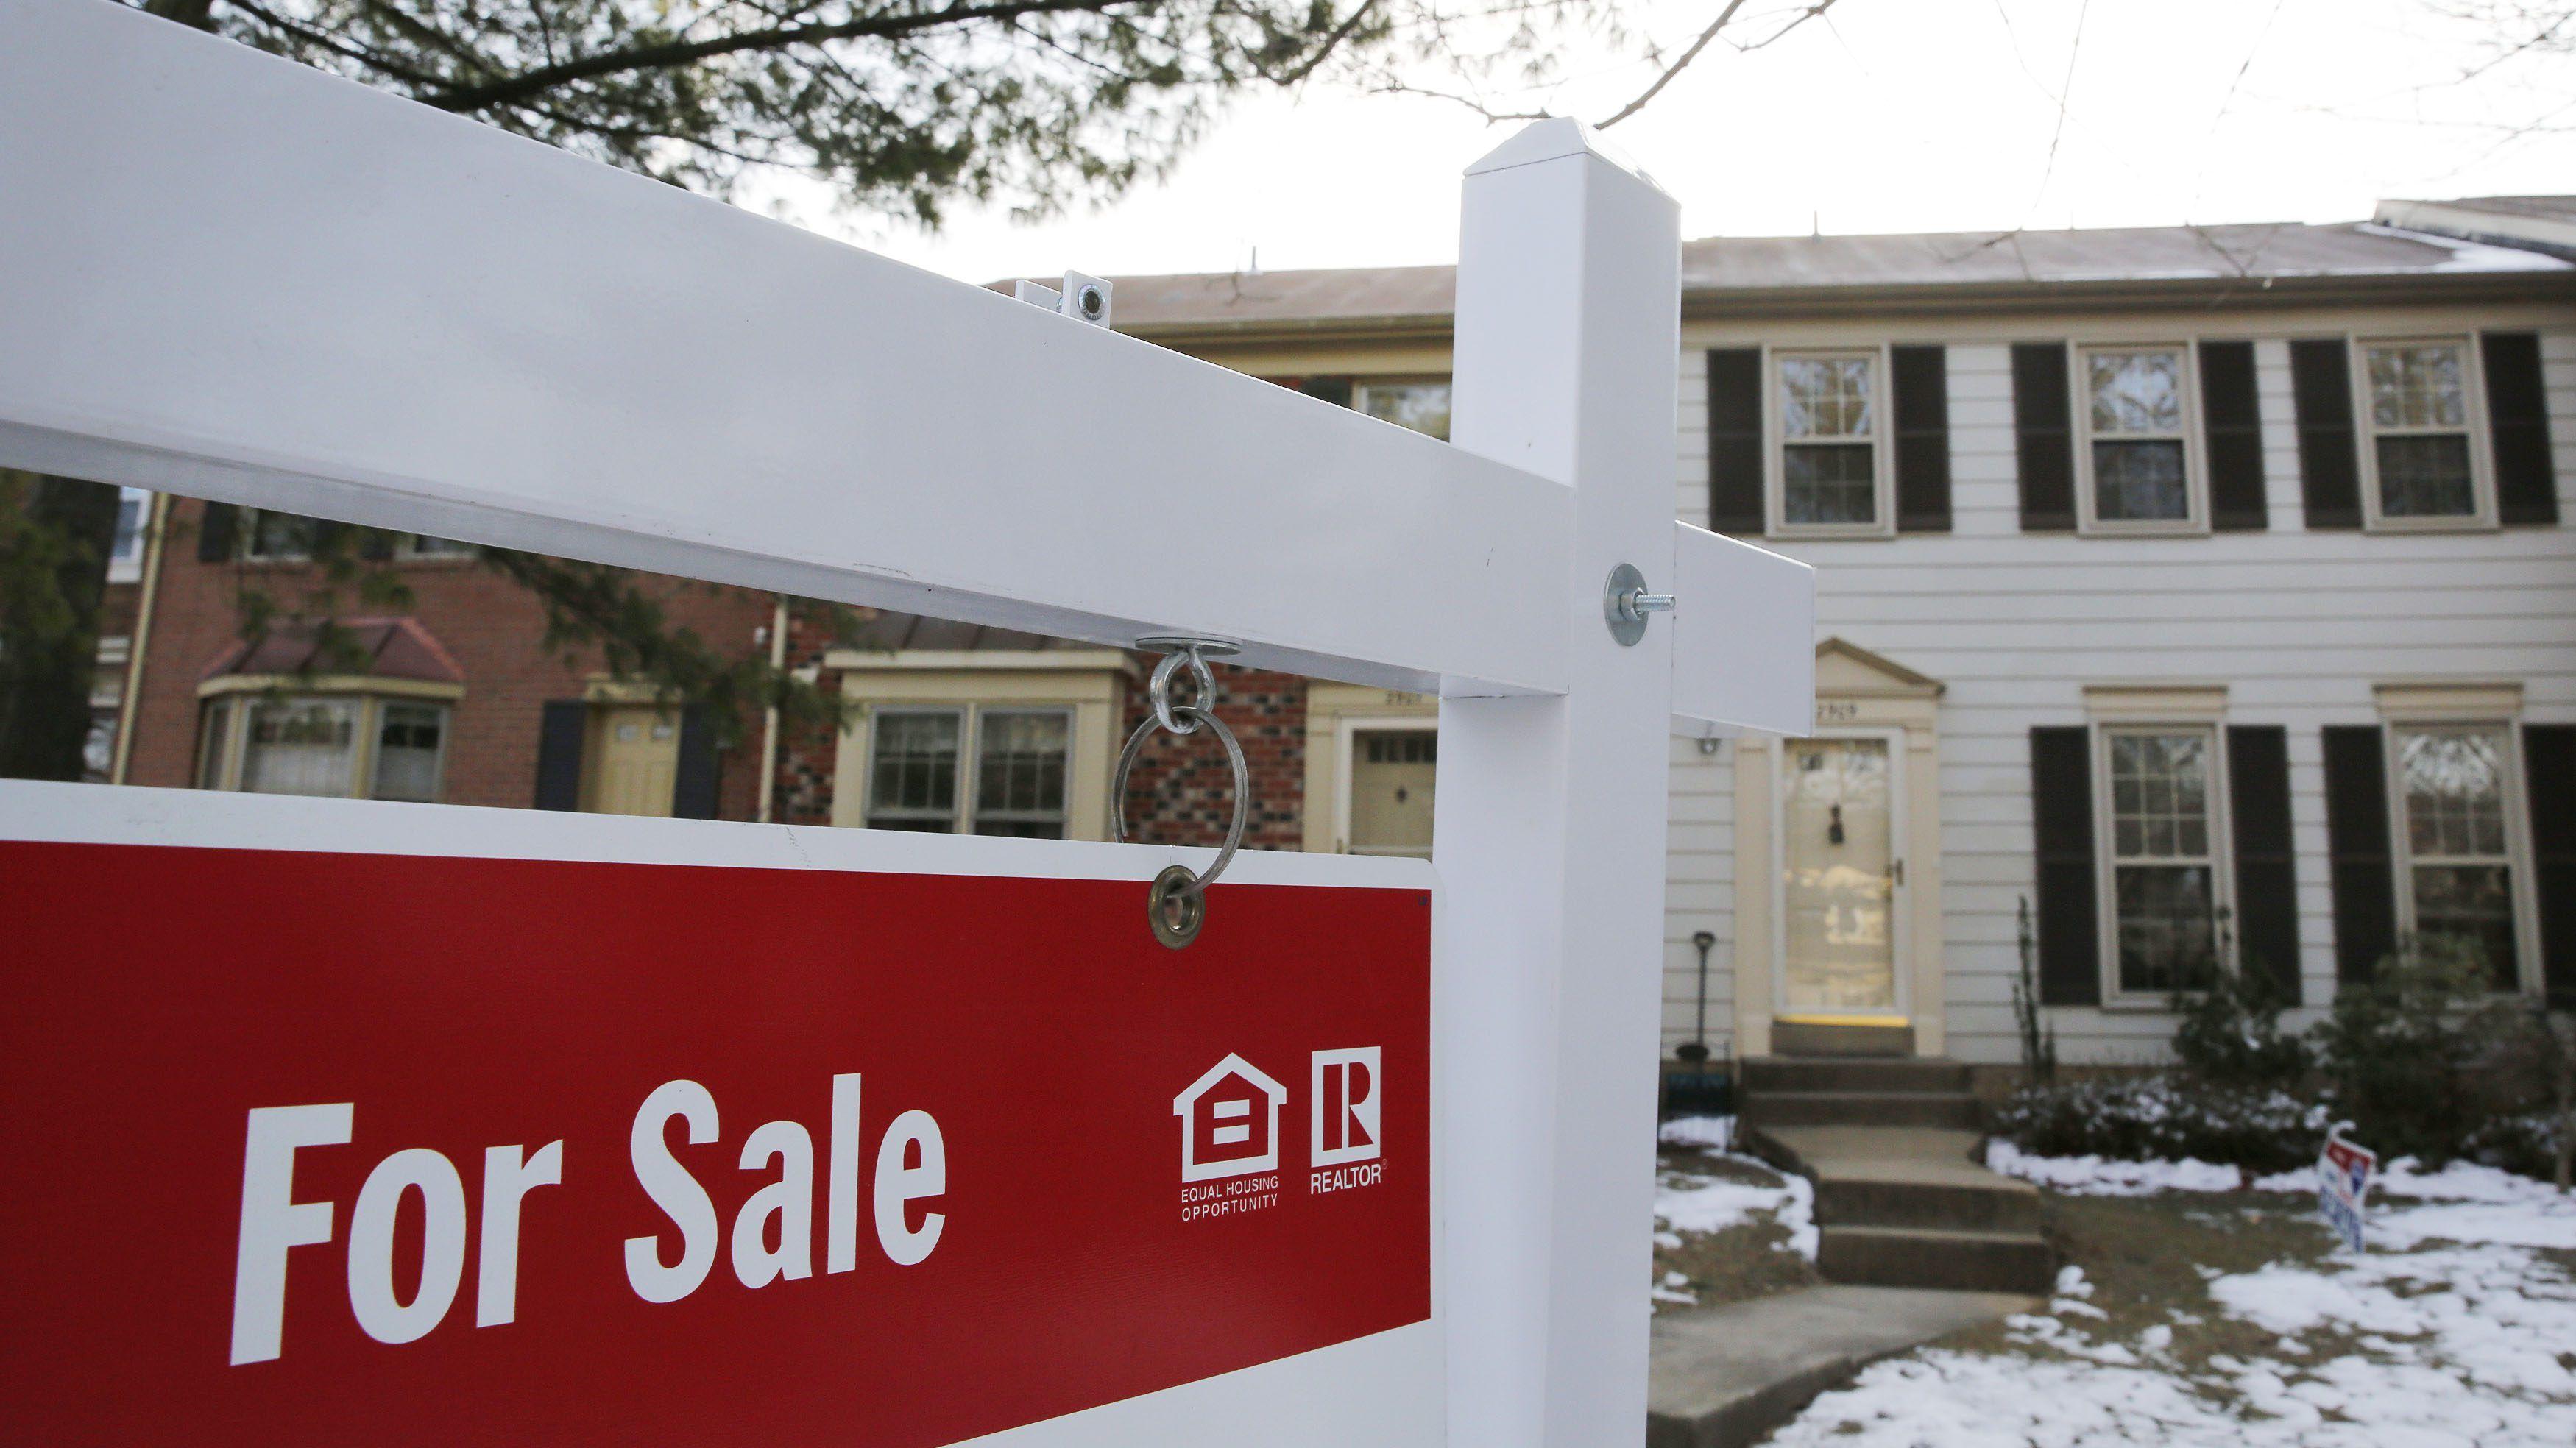 Loftium's Airbnb Mortgage Scheme raises serious Ethical and